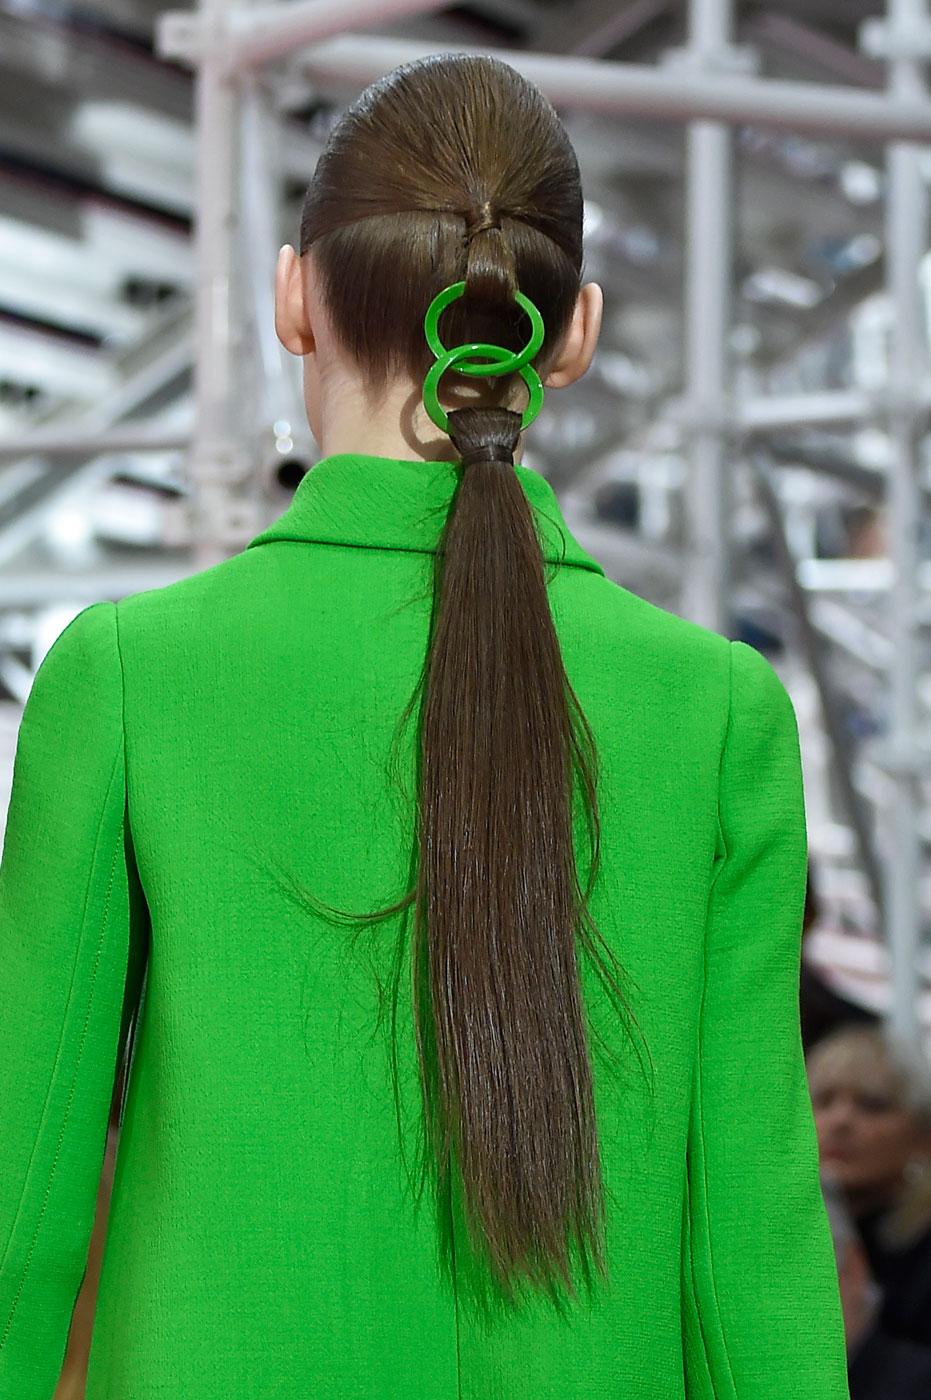 Christian-Dior-fashion-runway-show-close-ups-haute-couture-paris-spring-summer-2015-the-impression-039